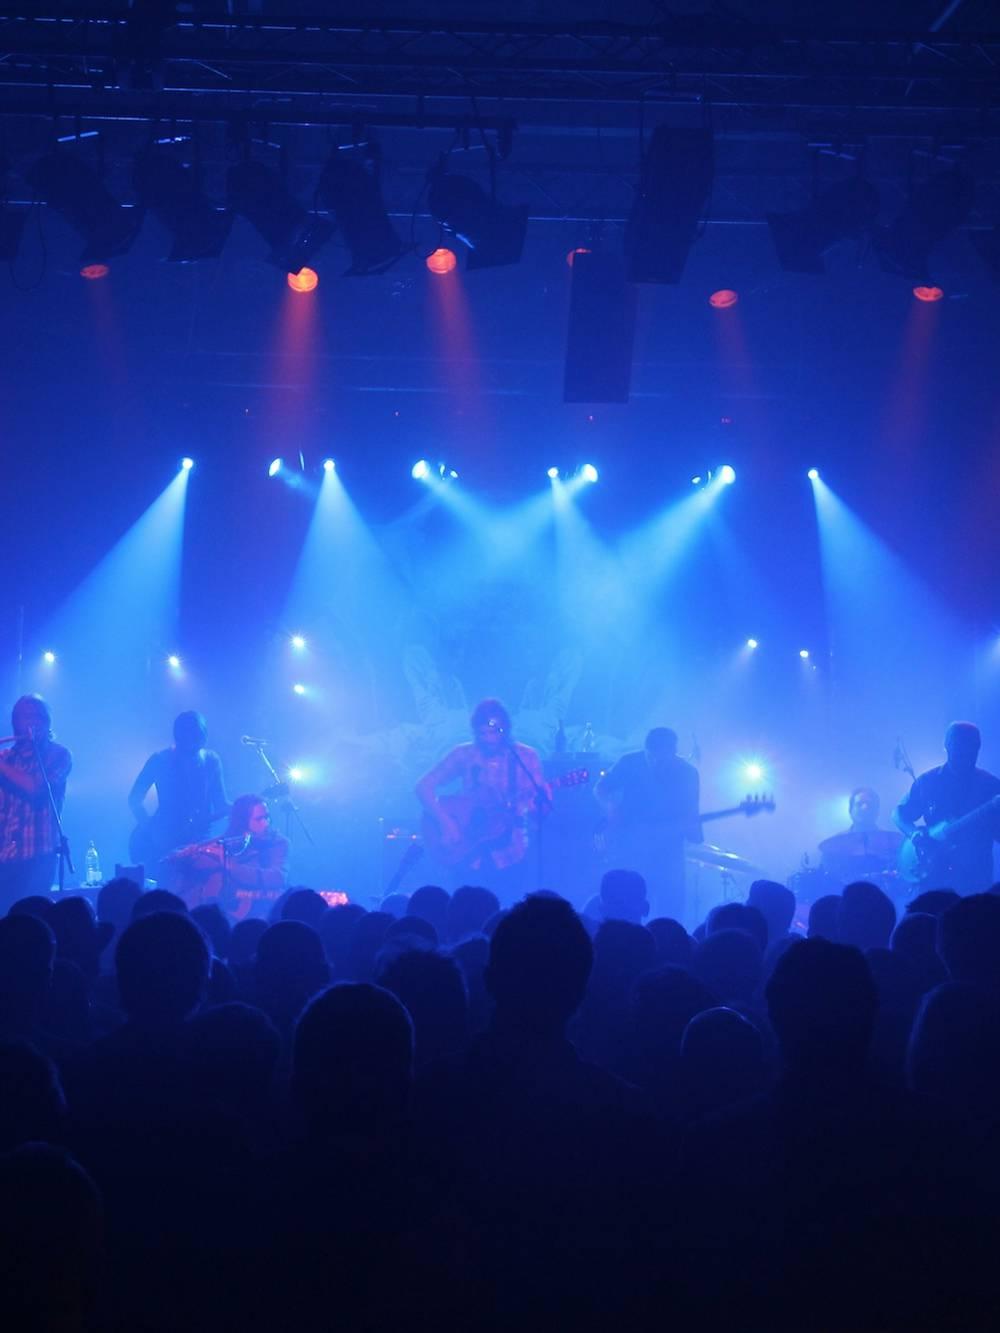 Event Lighting Hire for a Concert near Birmingham